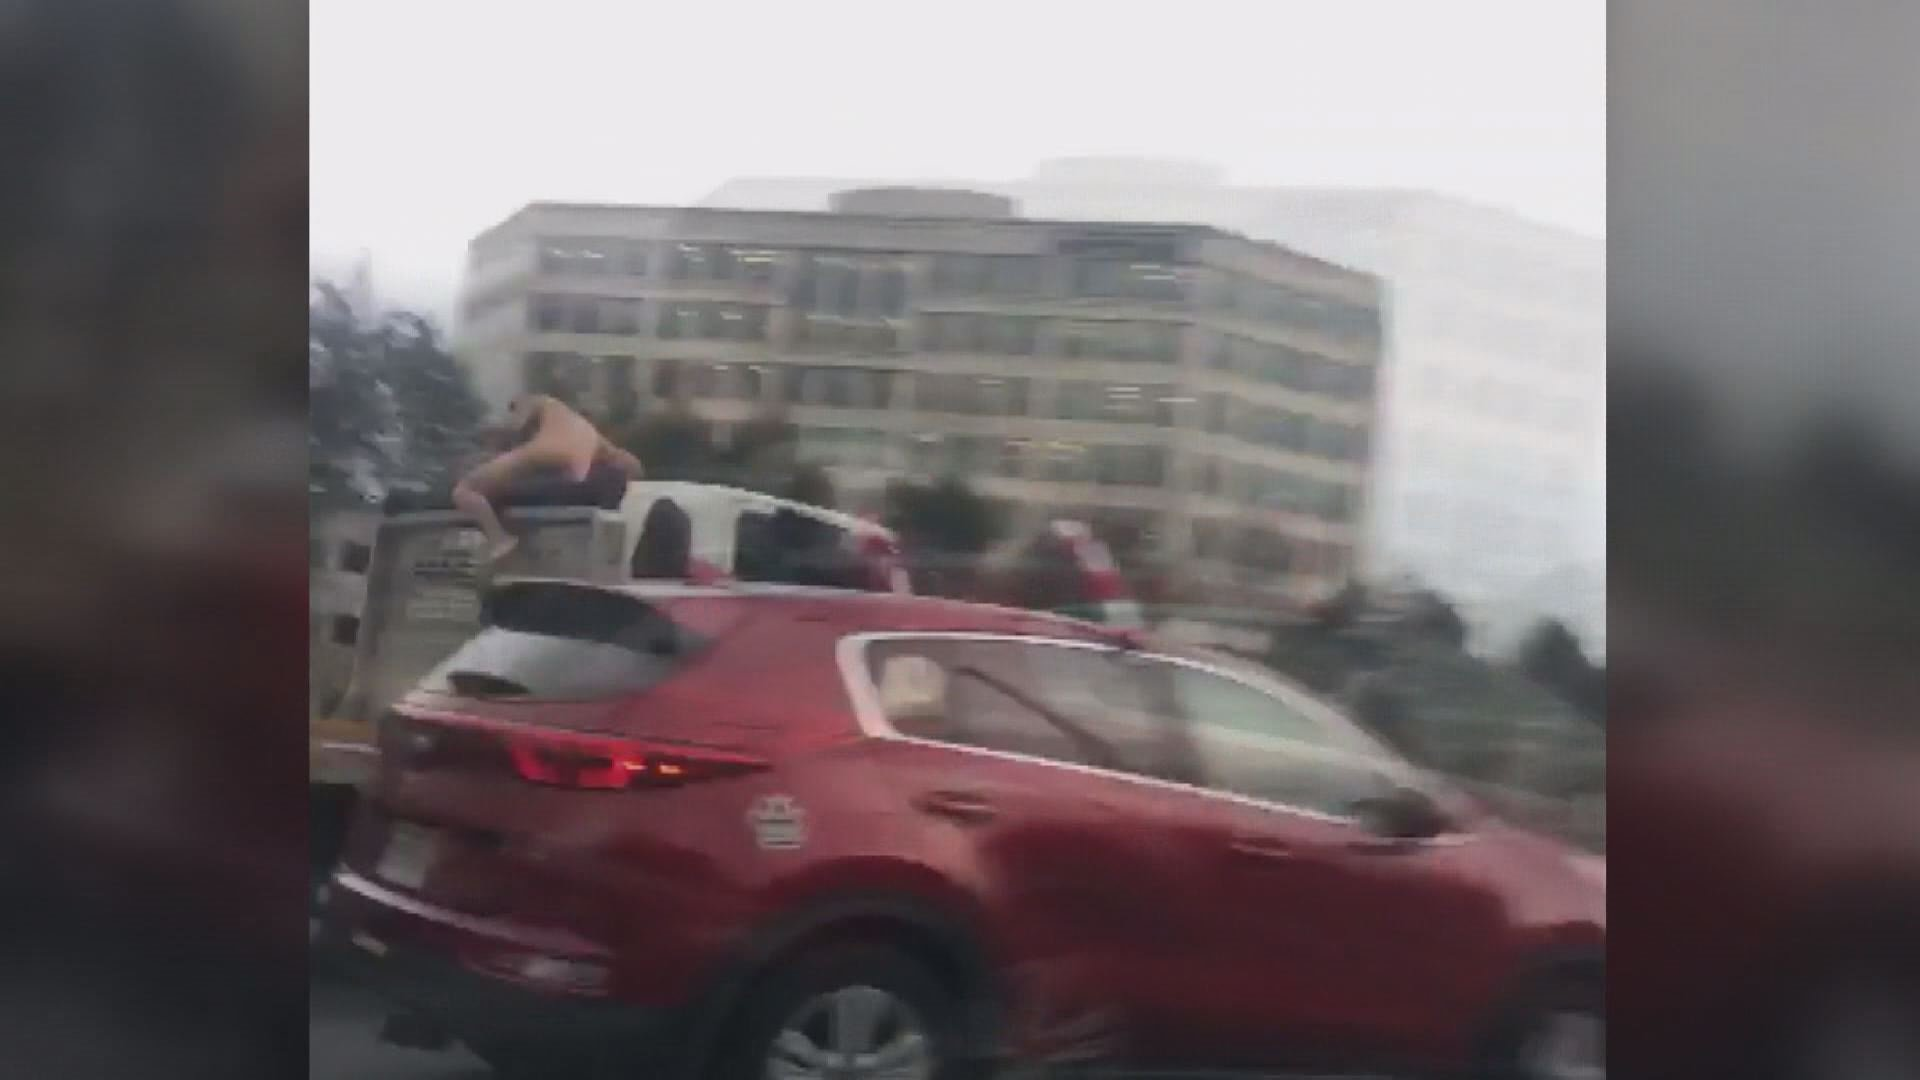 Naked man hops on truck after crashing on Va. highway https://t.co/h6VylNgRQu via @wusa9 https://t.co/Pns8c2rclt